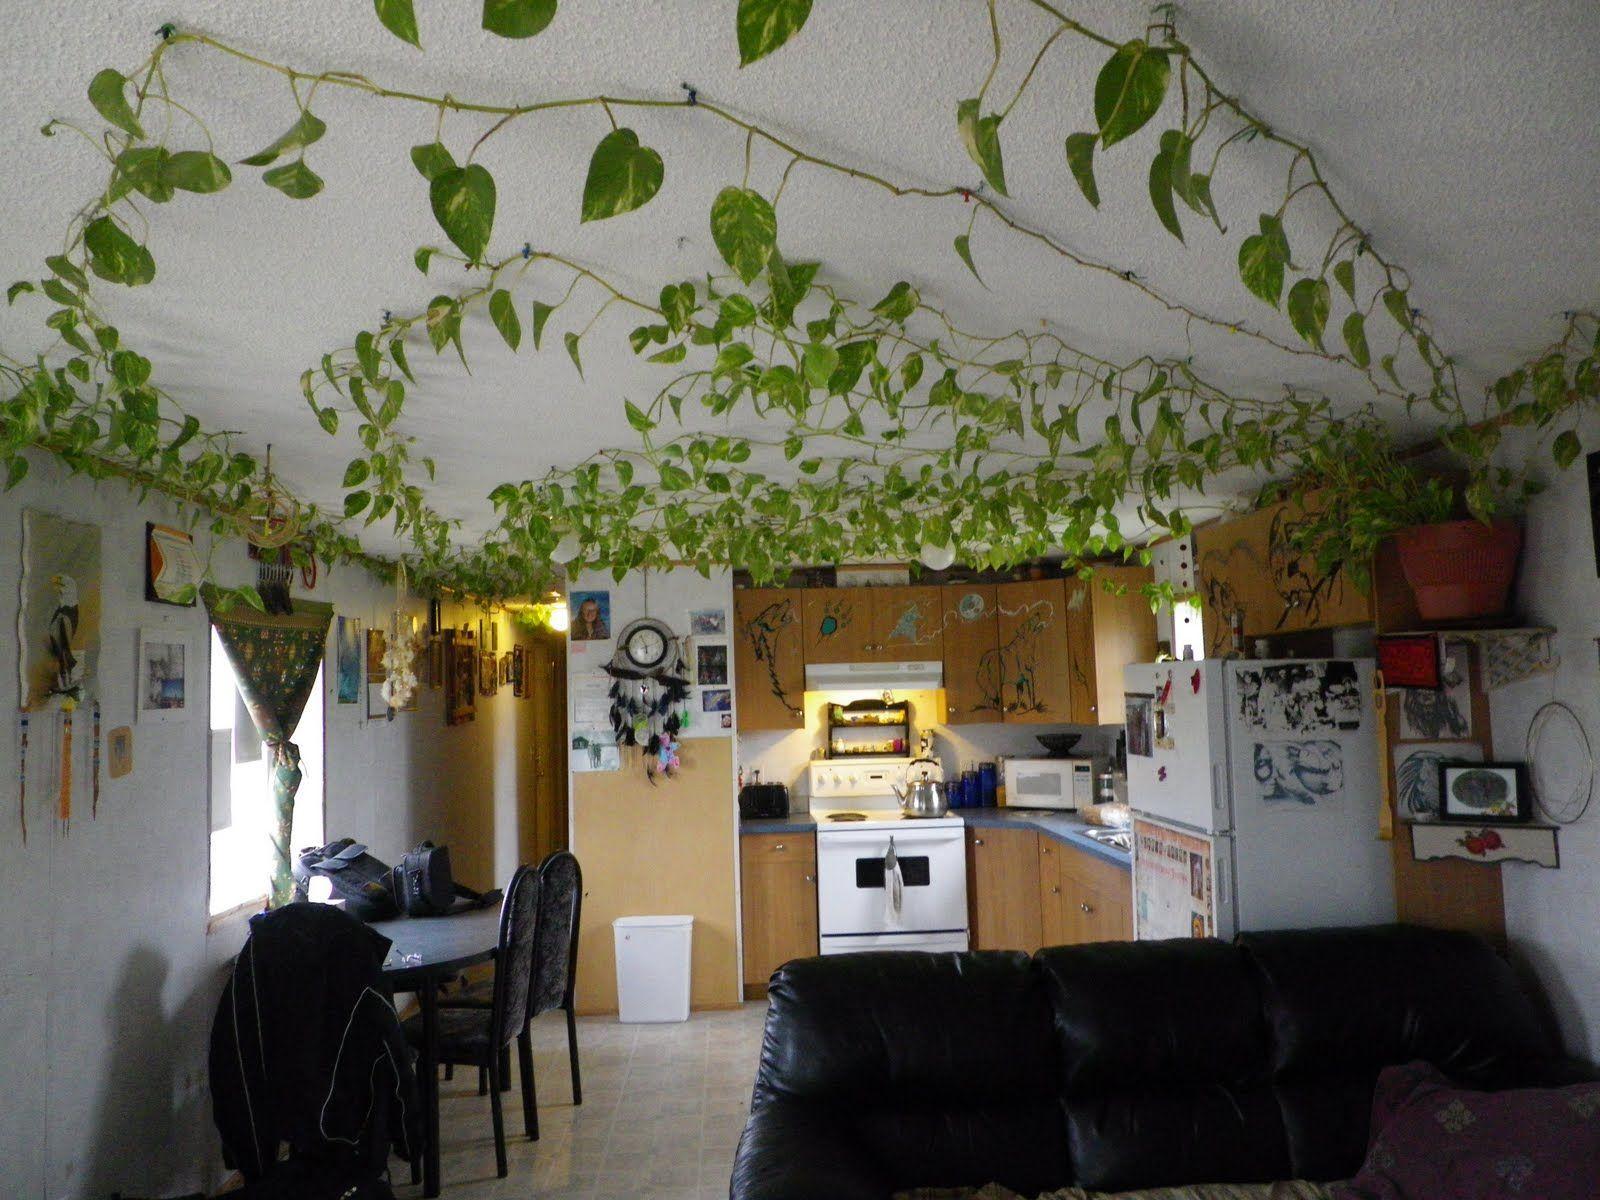 Pin By Carolyn Bradshaw On Gardening Indoor Vines Indoor Plants Vine House Plants